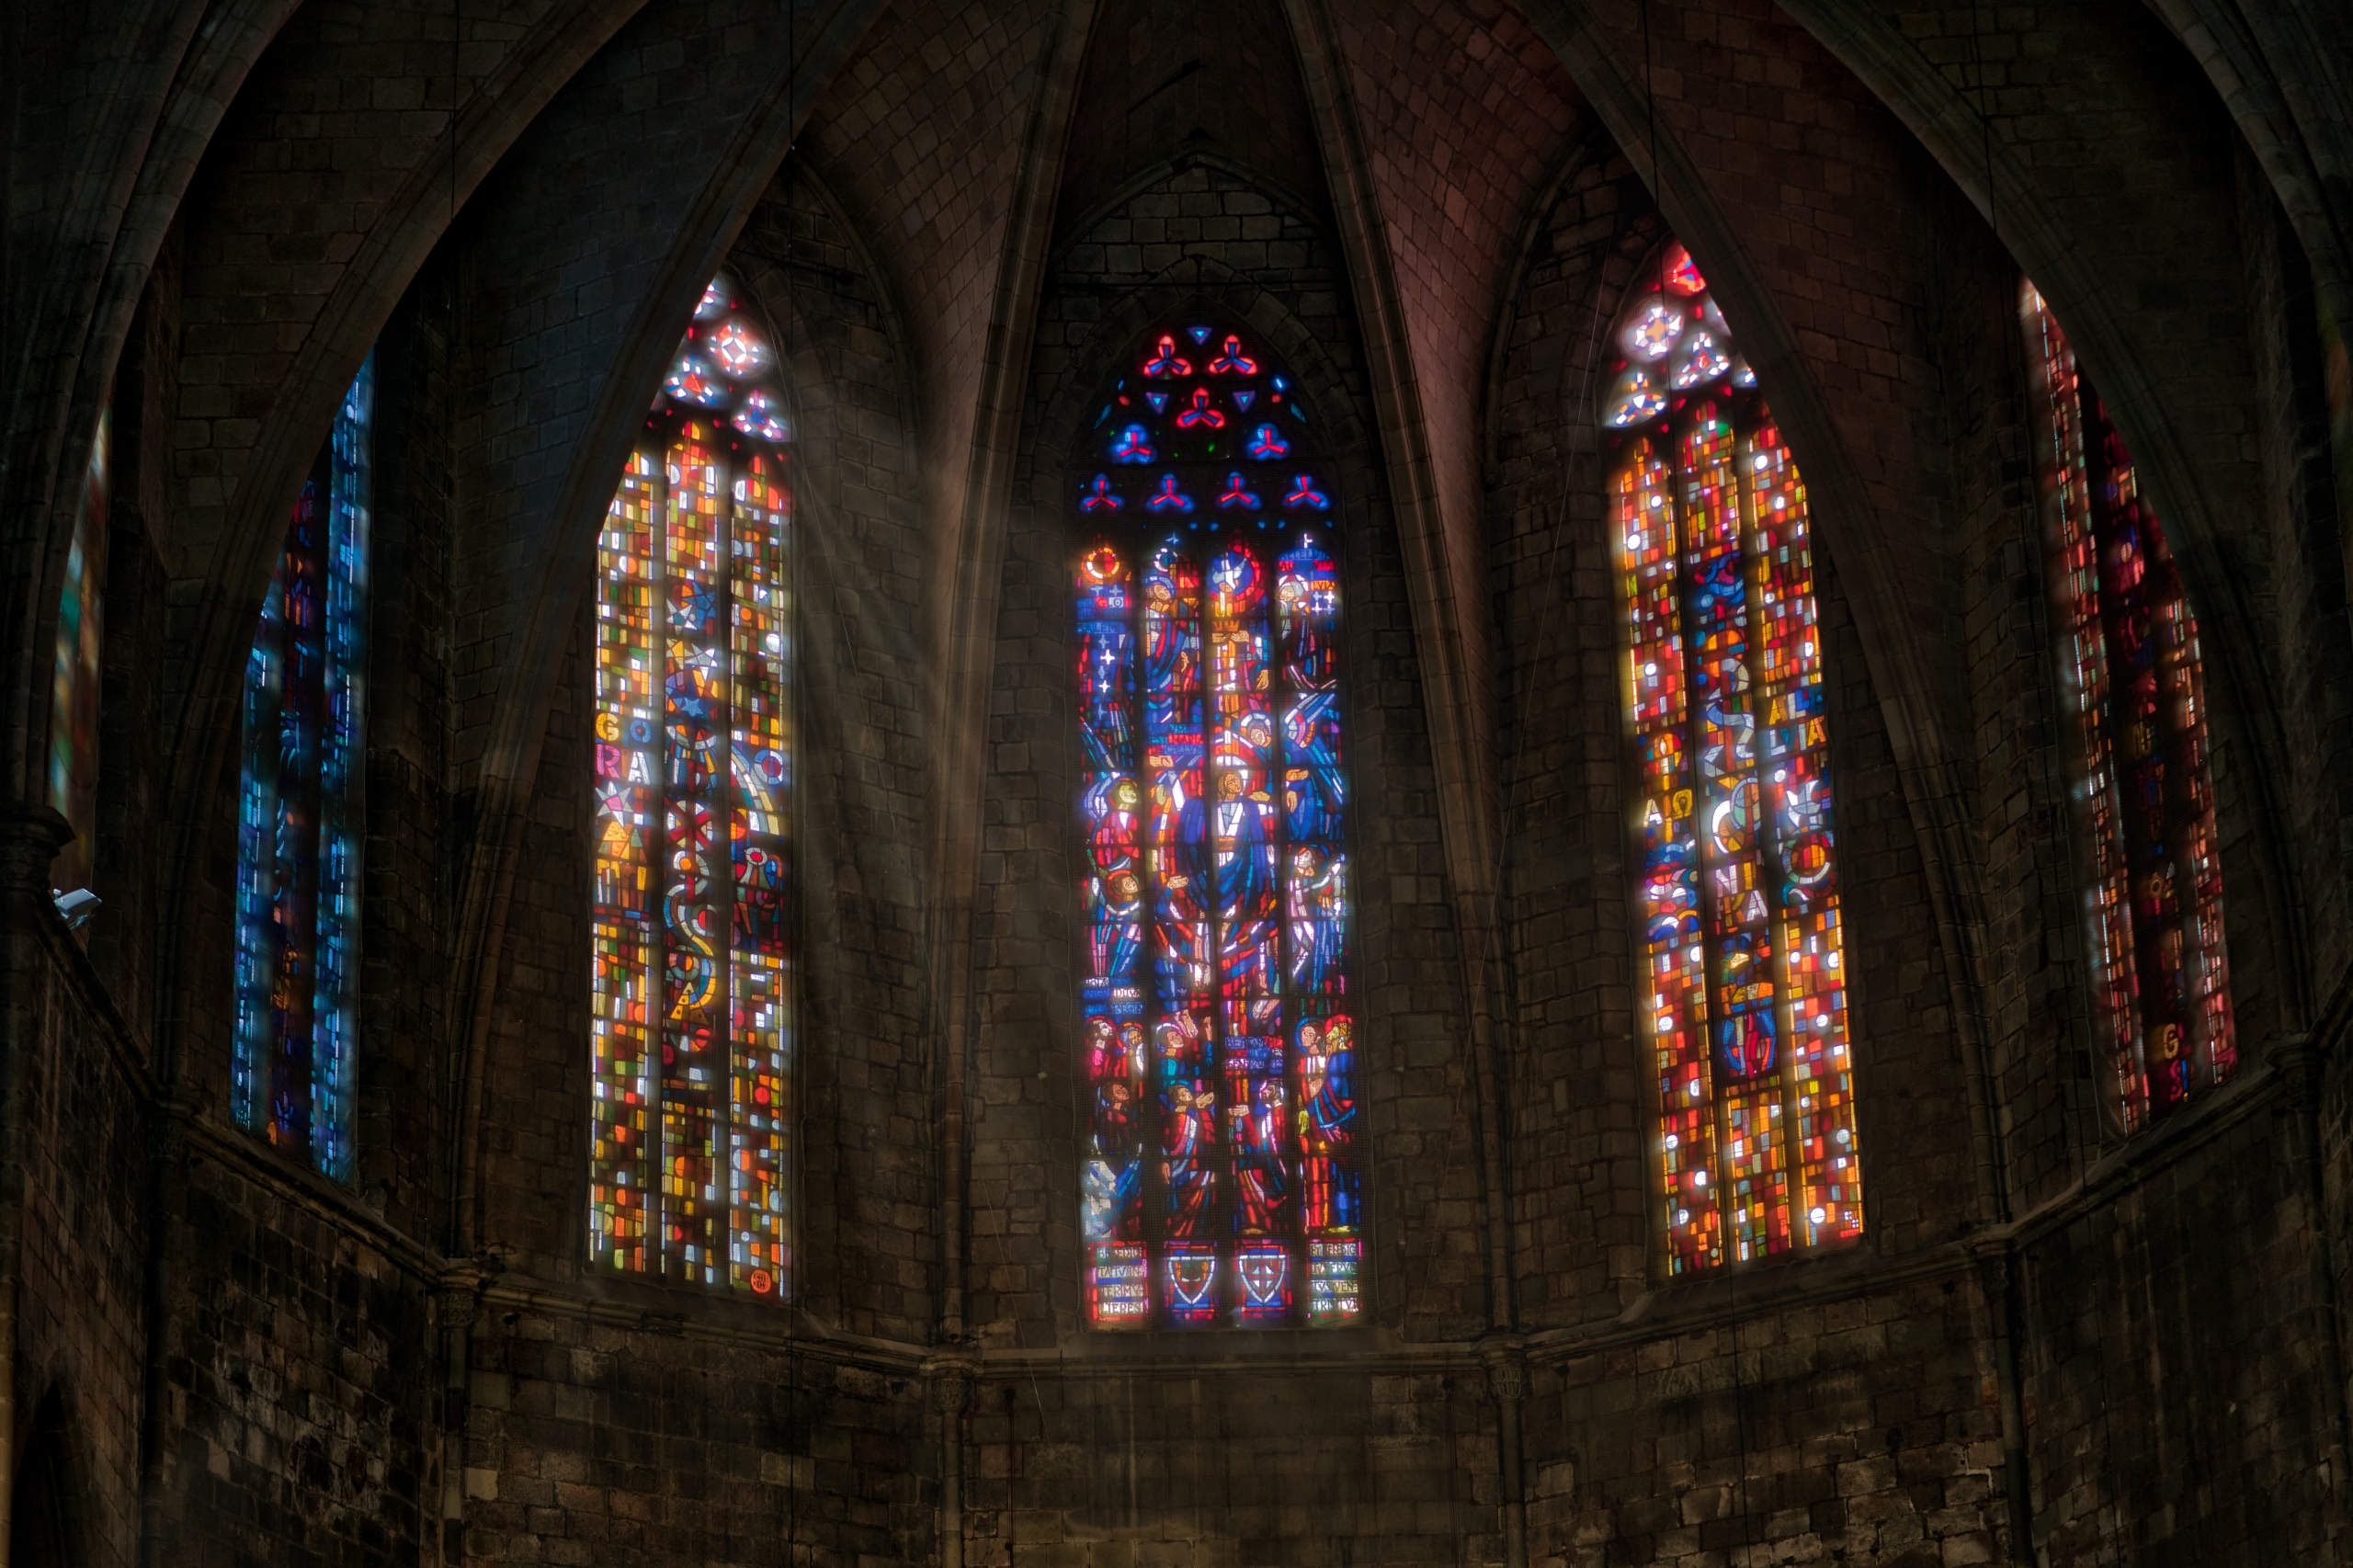 churches Barcelona Starbucks - cathedral - rickschwartz | ello